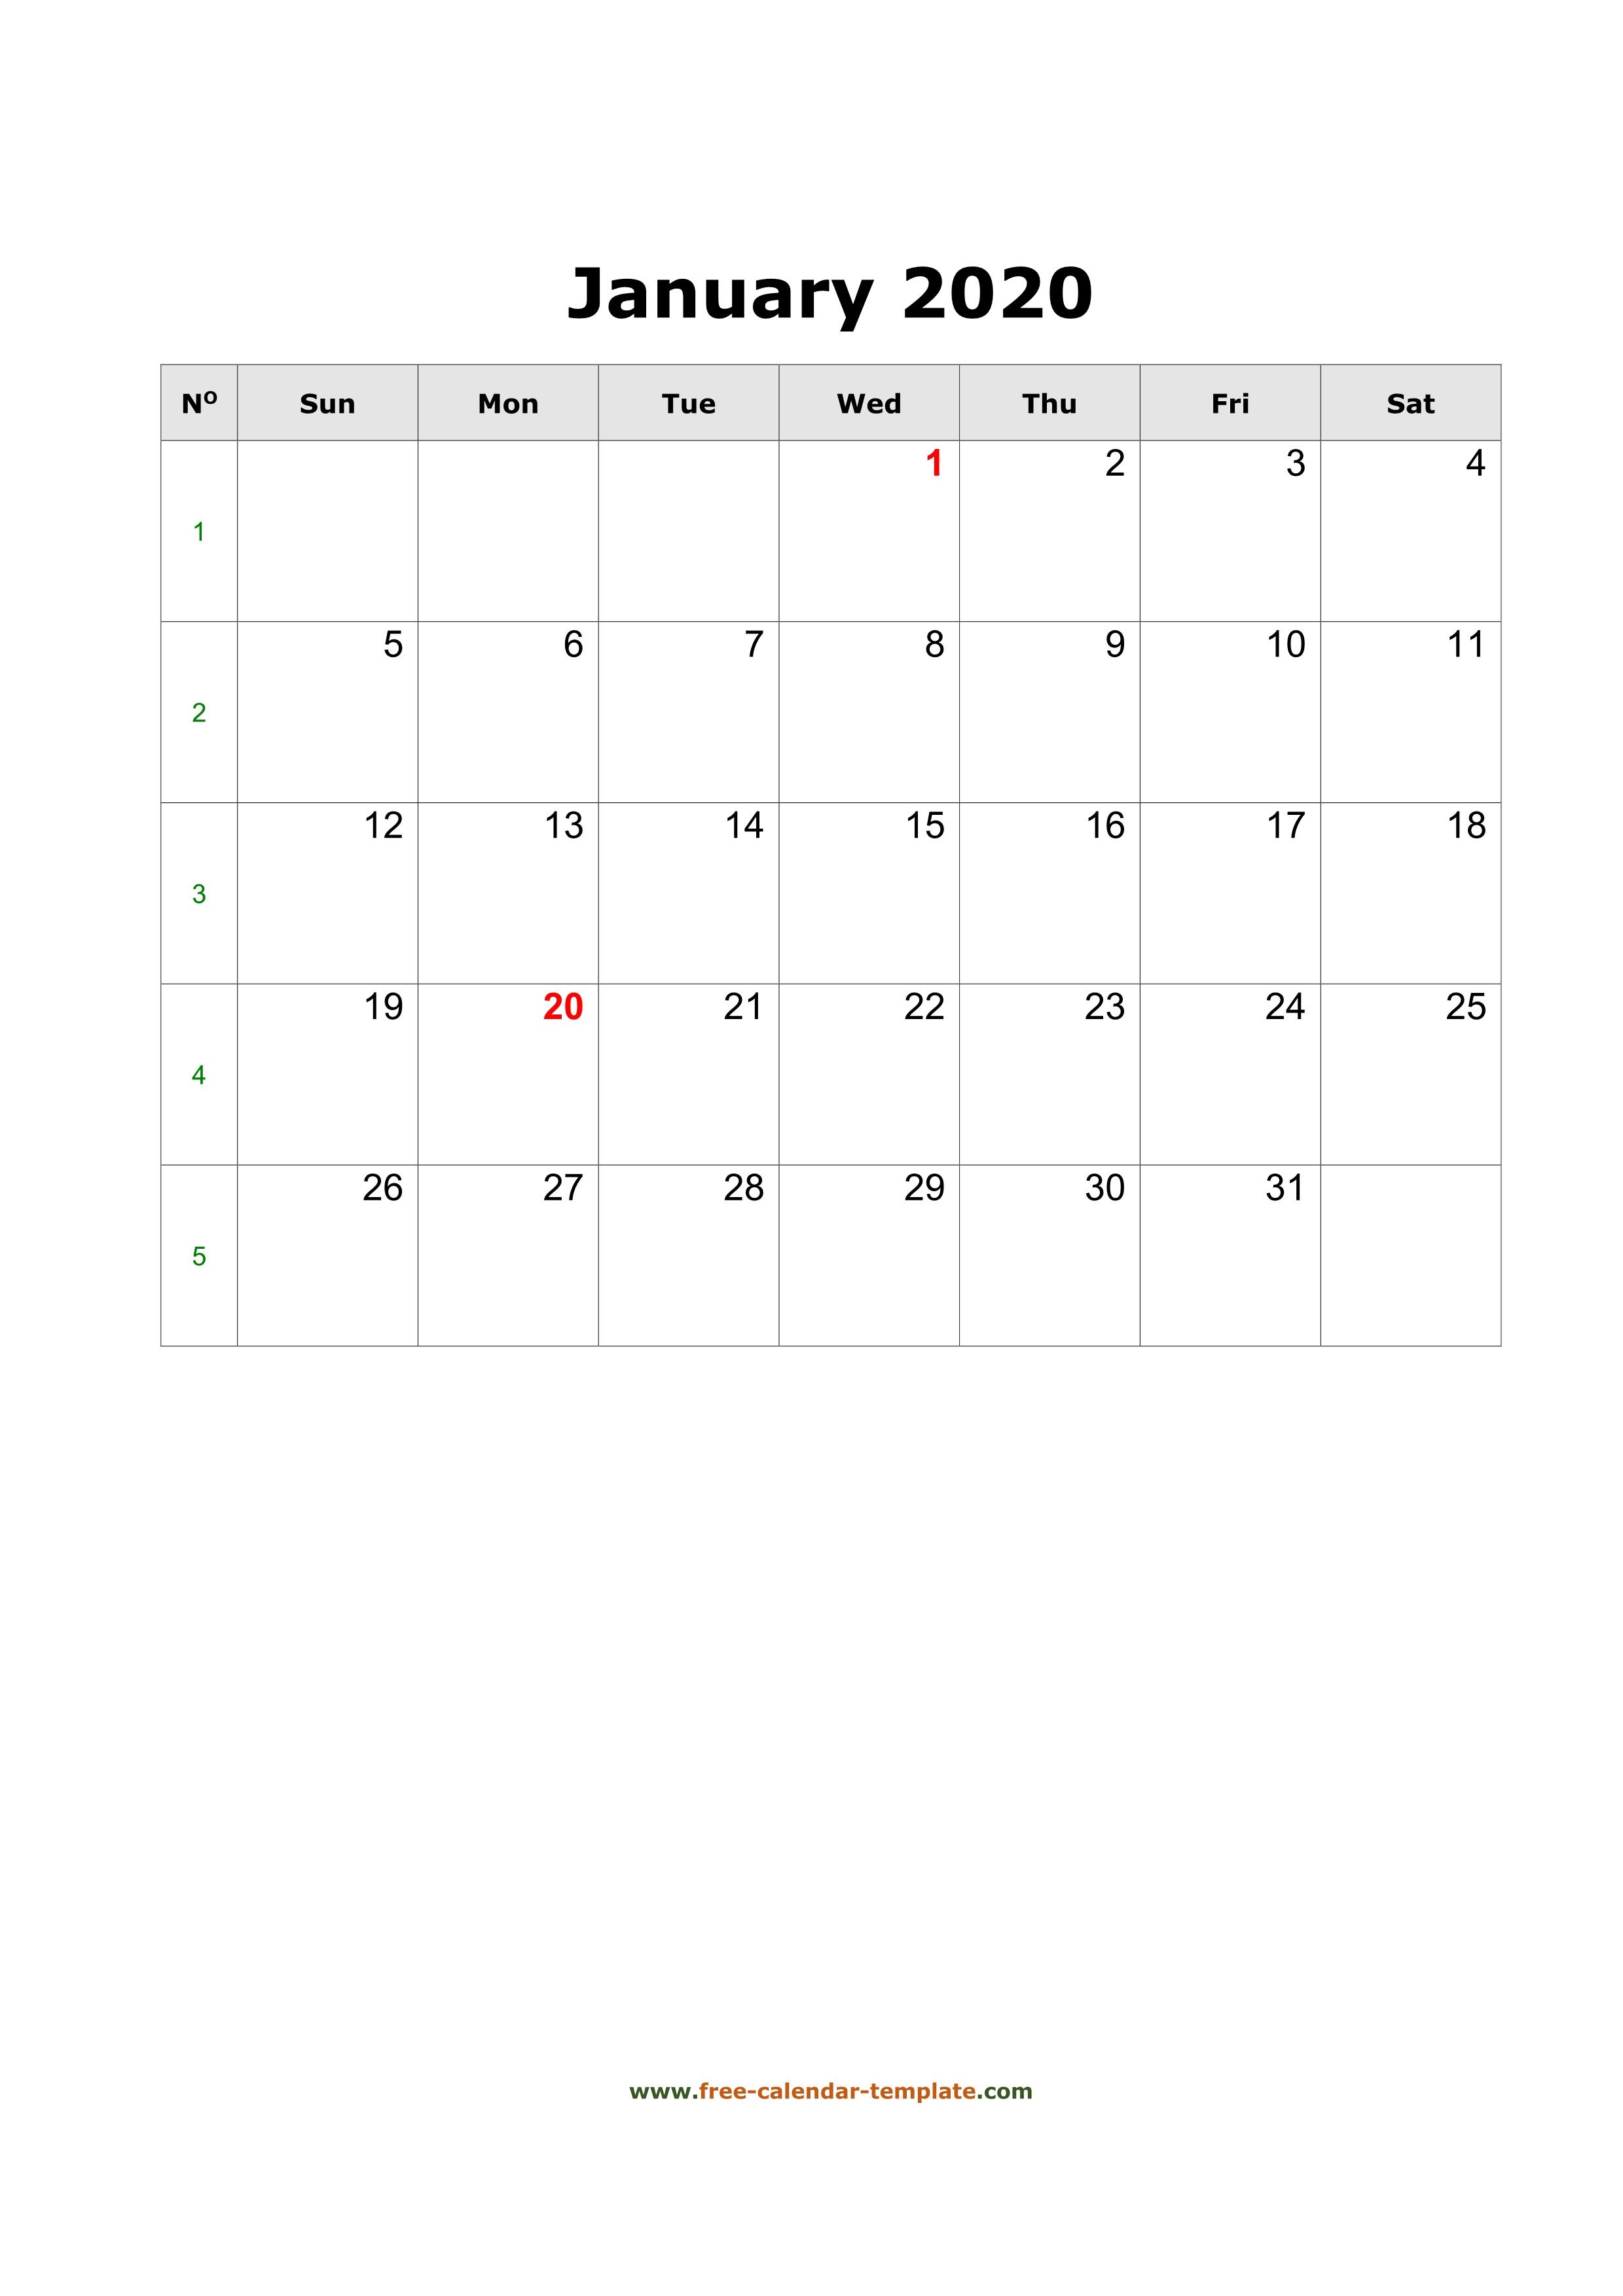 2020 January Calendar (Blank Vertical Template) | Free